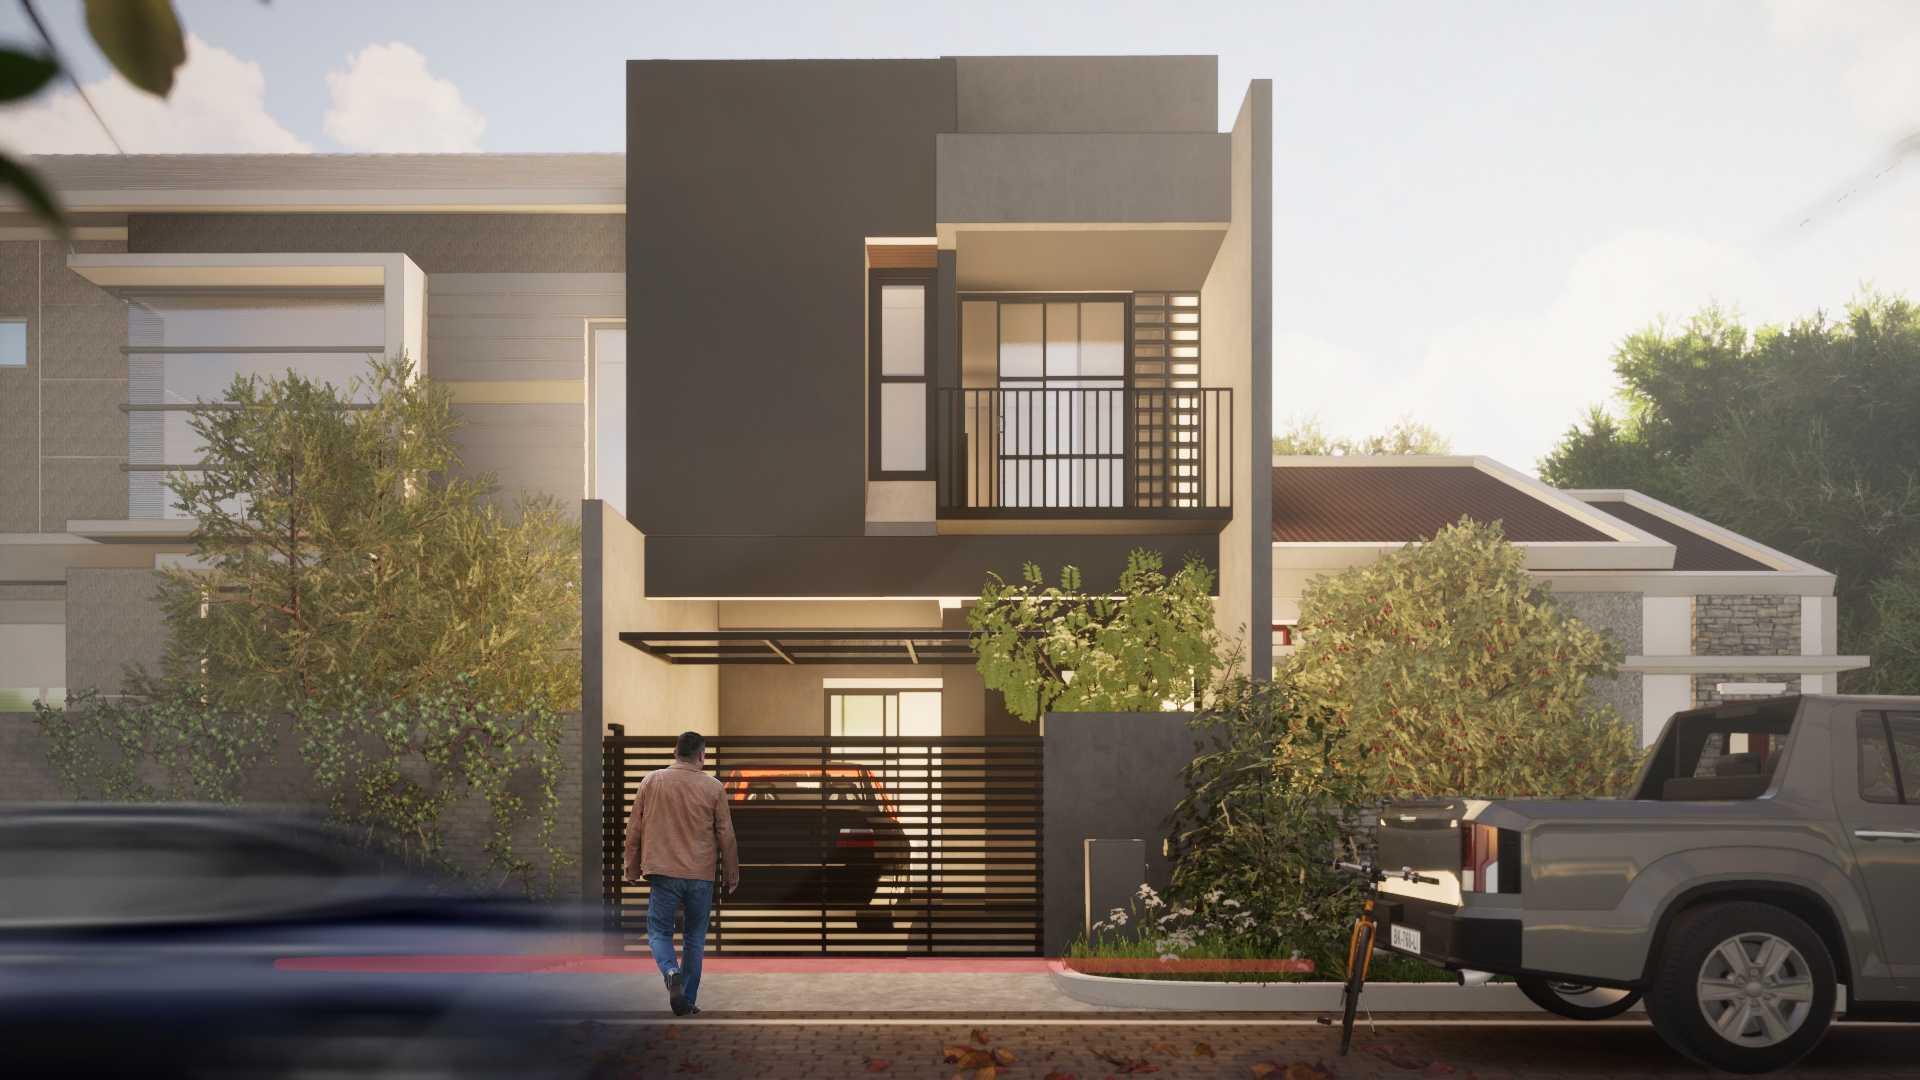 Aksa & Partners New Box Home Cibinong, Bogor, Jawa Barat, Indonesia Cibinong, Bogor, Jawa Barat, Indonesia Aksa-Partners-New-Box-Home  129550